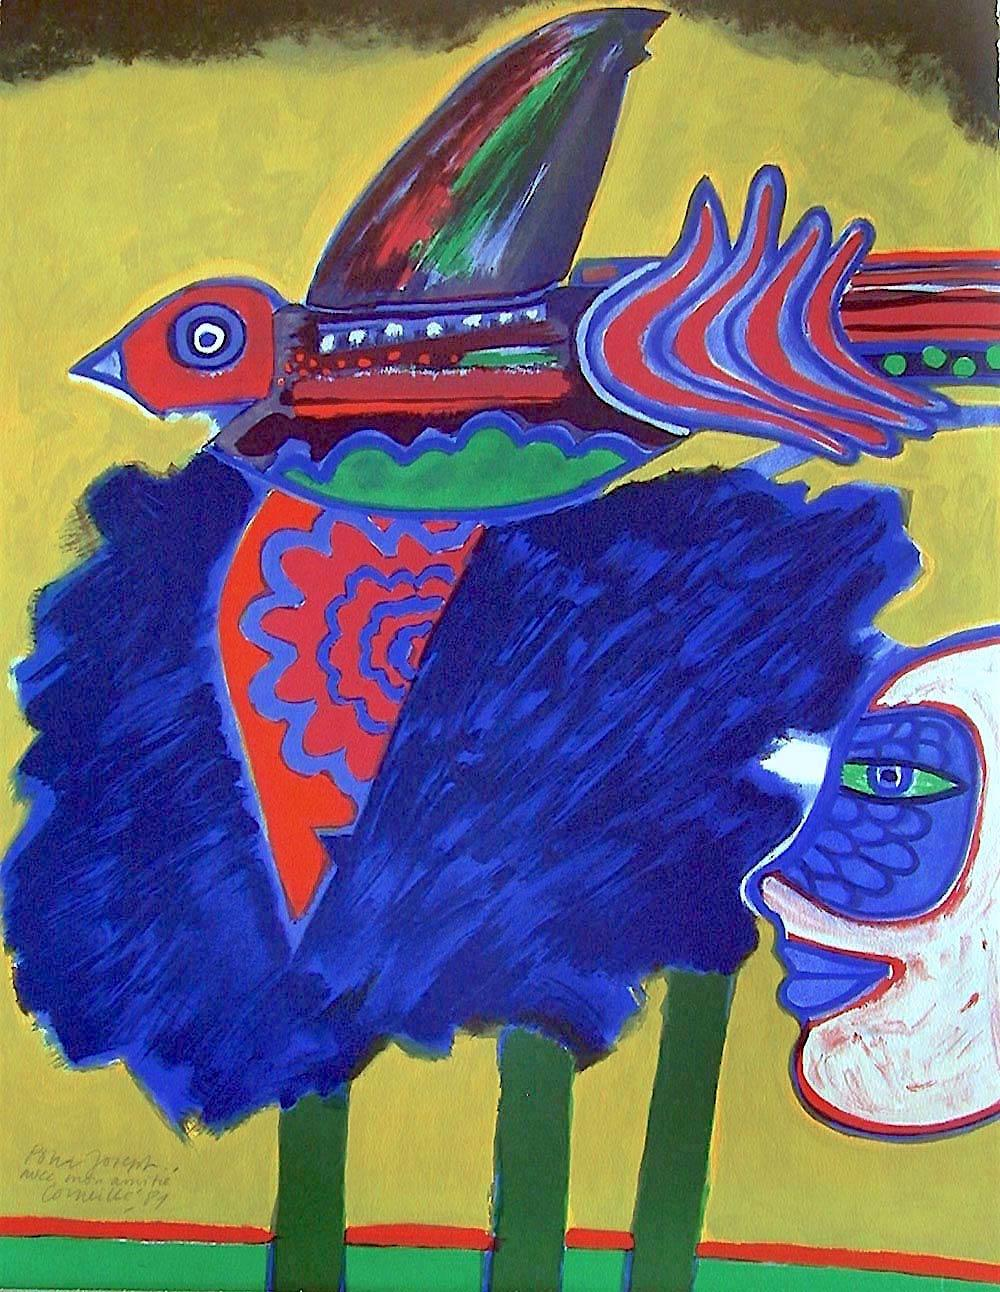 L' Arbre à L'Oiseau Signed Lithograph, Exotic Bird, Trees, Face, CoBra Artist